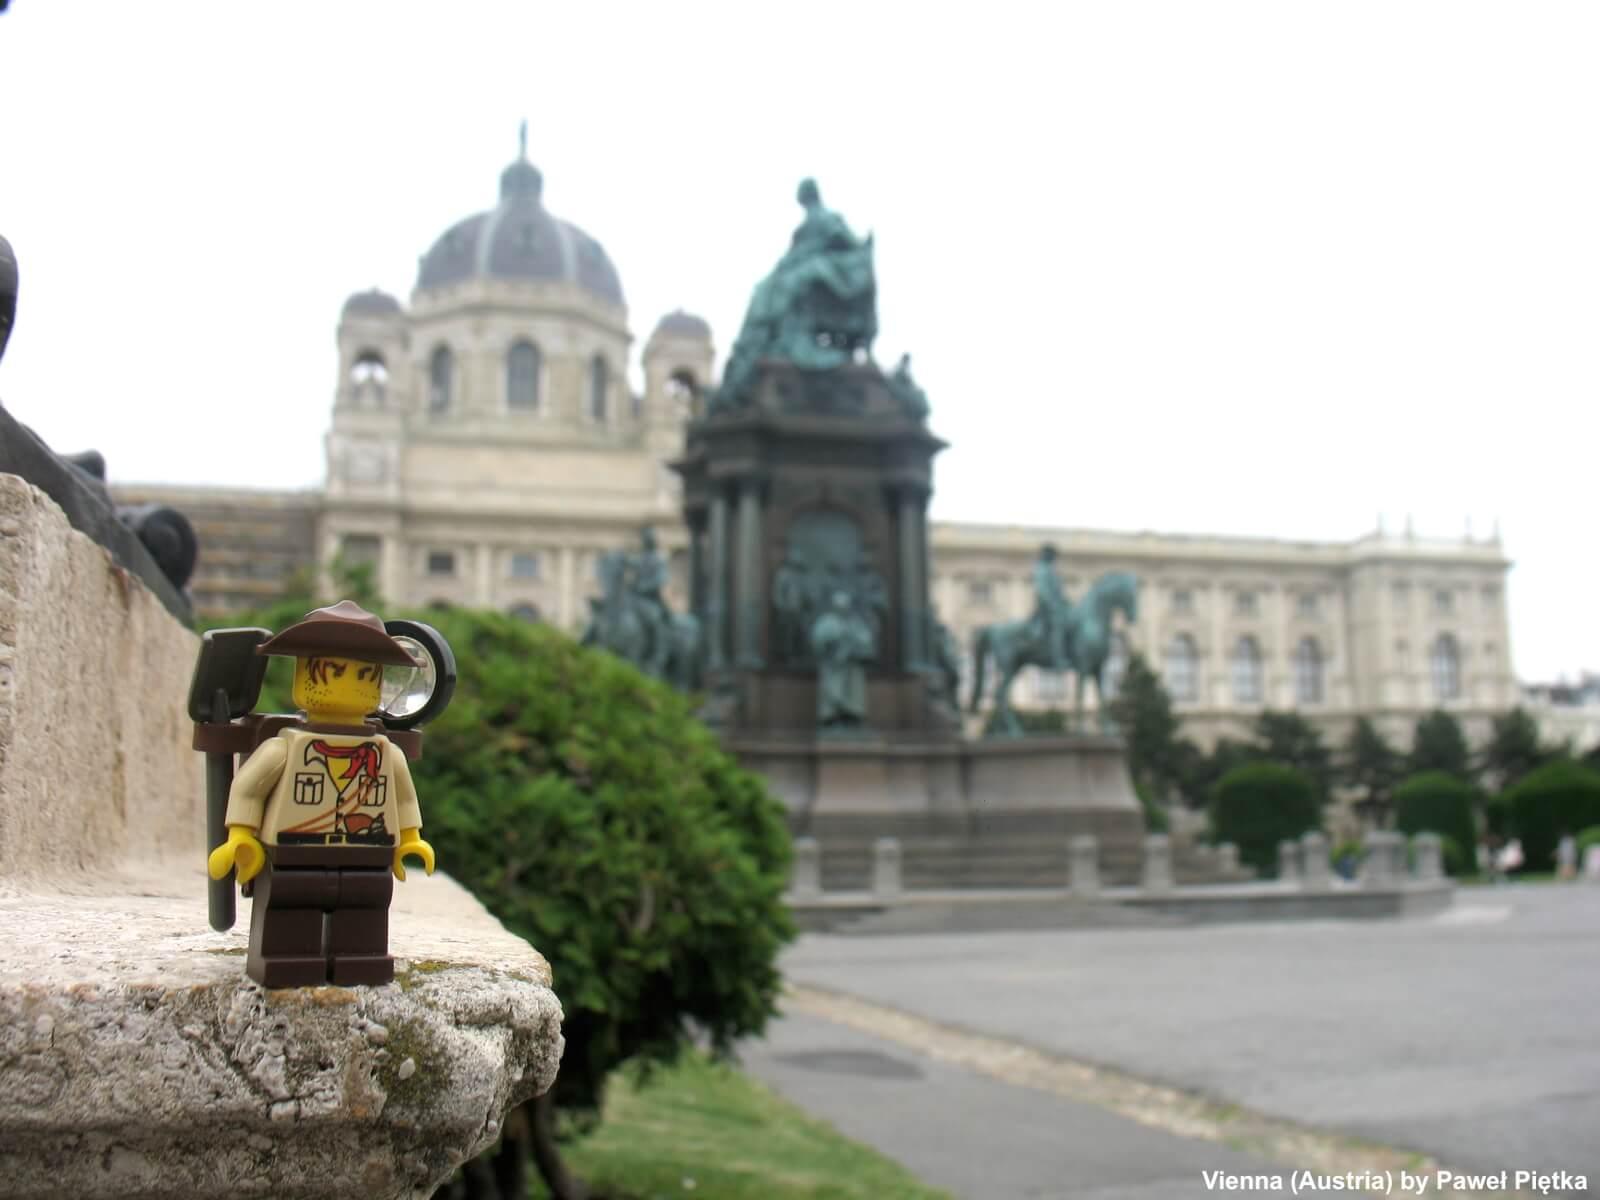 Vienna (Austria) - Kunsthistorisches Museum of Natural History